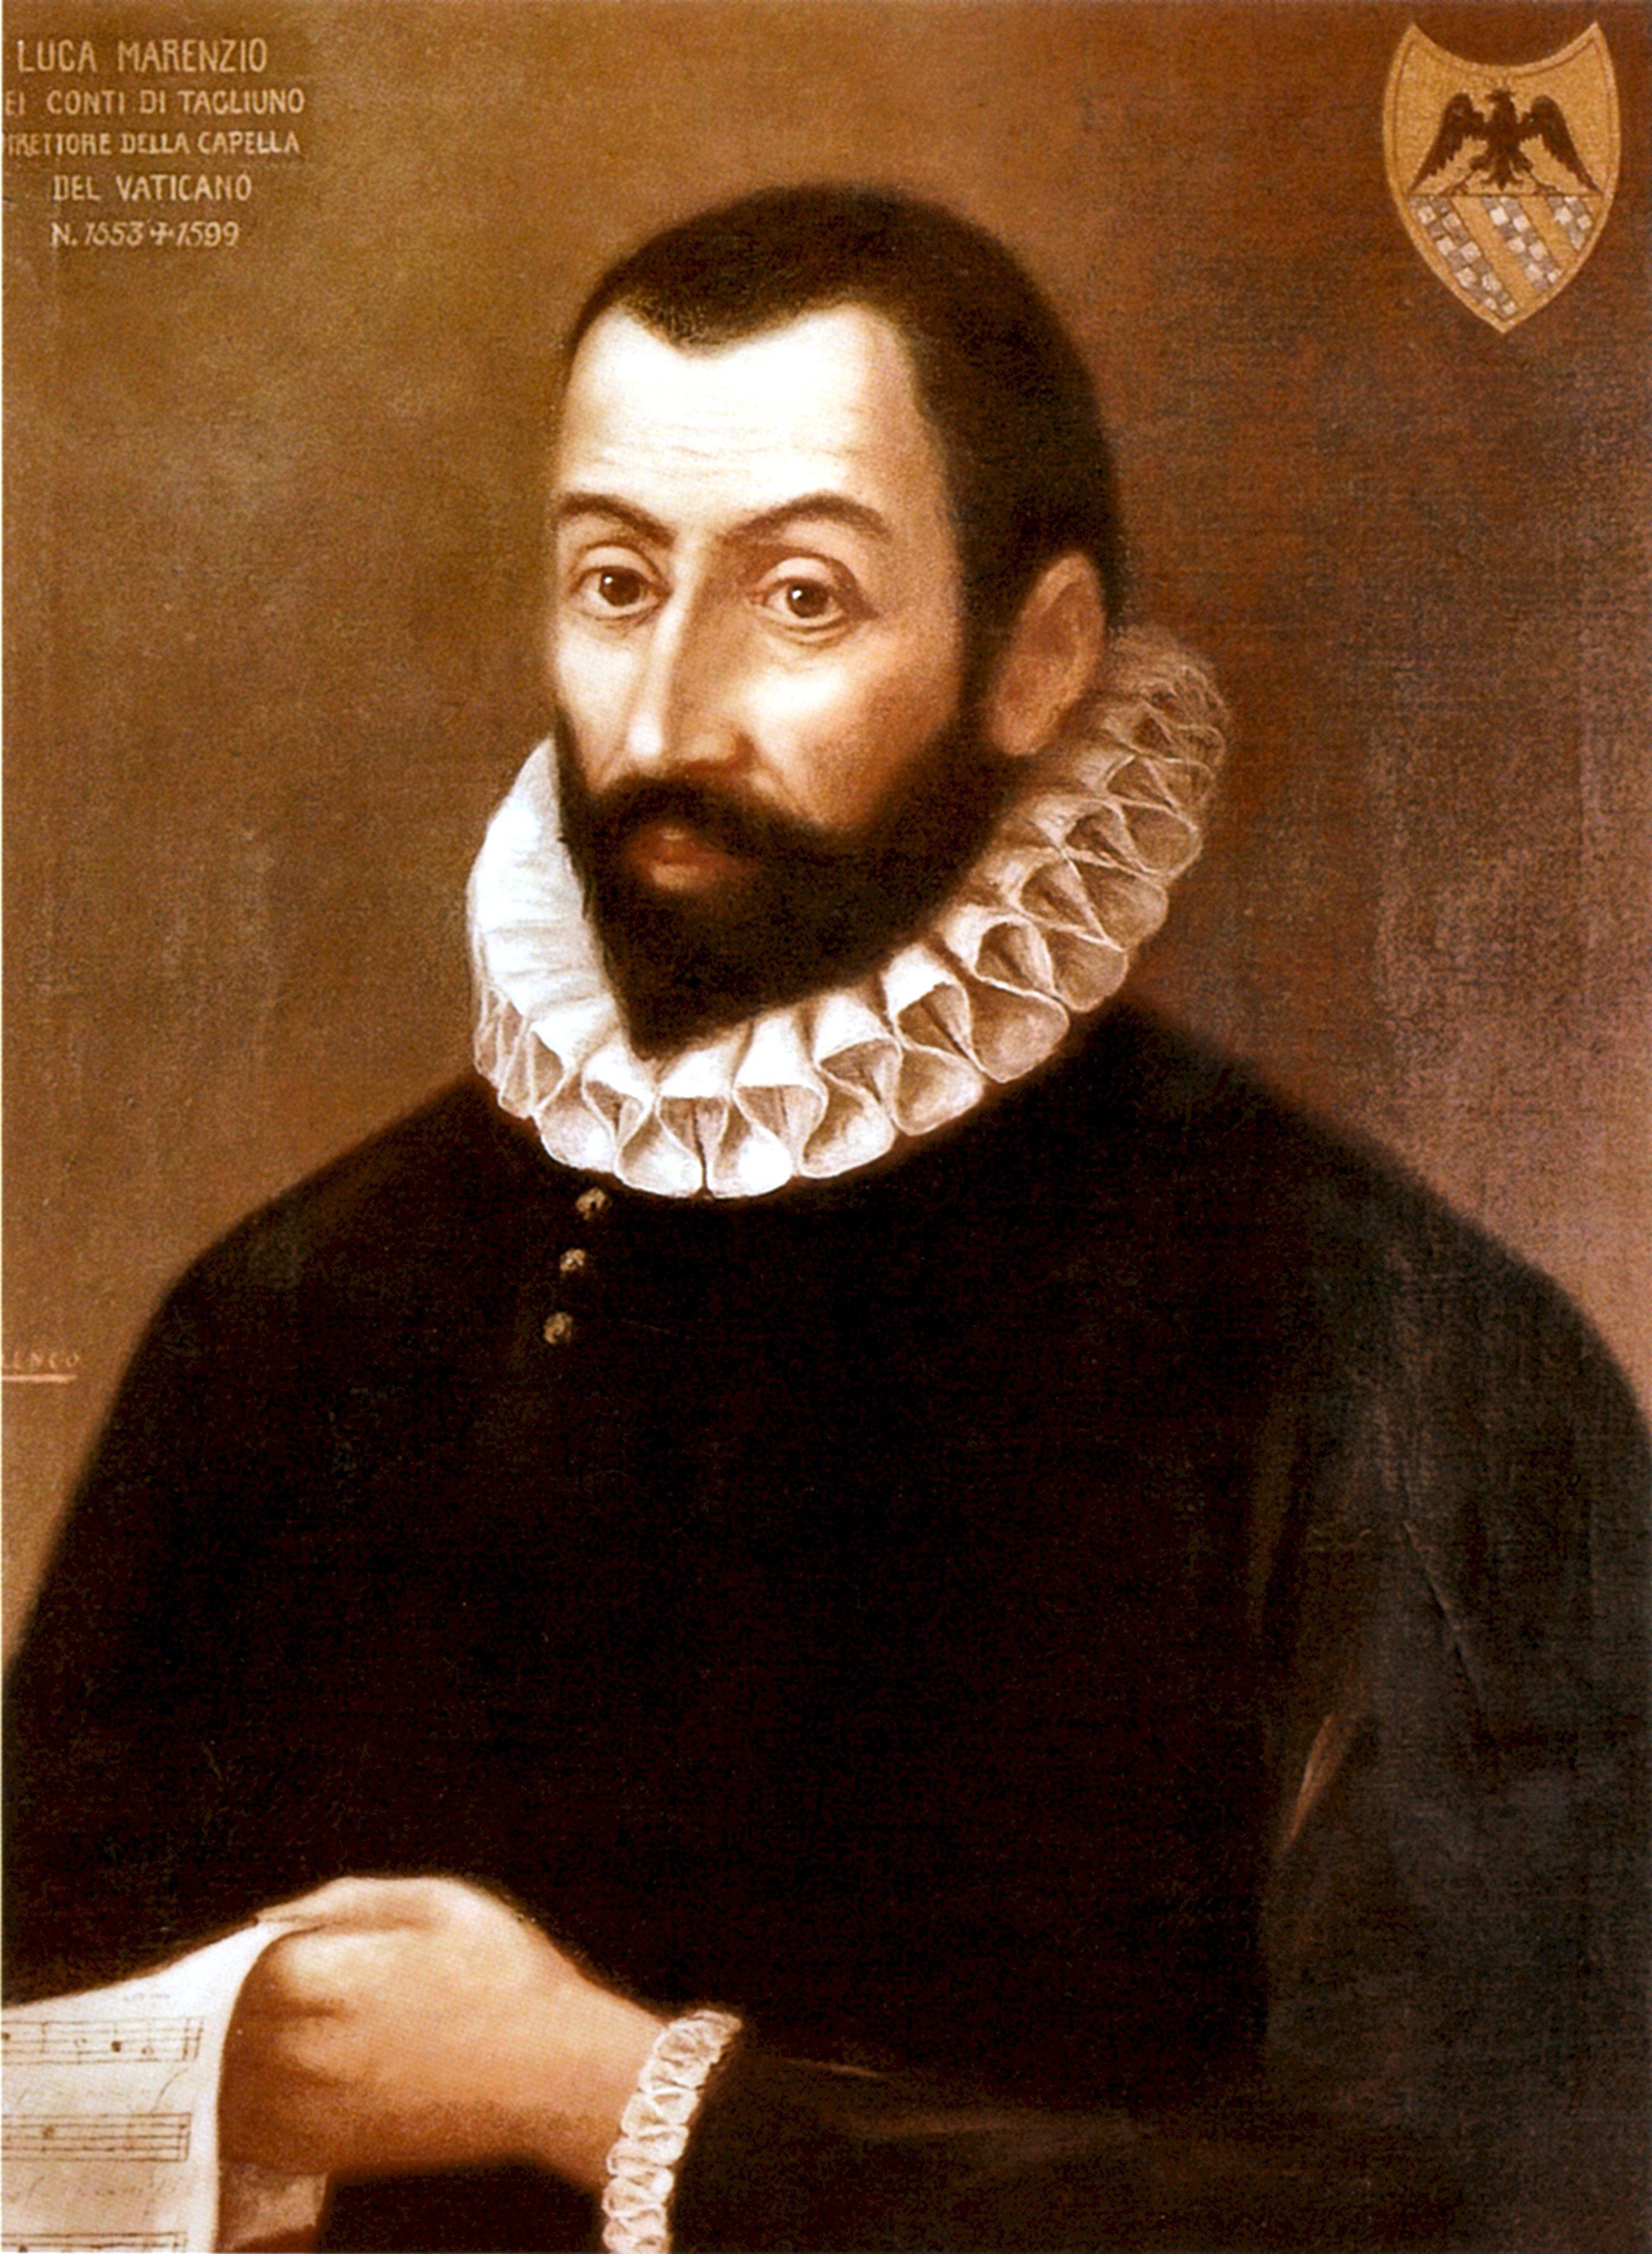 File:Luca conte Marenzio, Komponist des 16. Jahrhunderts ...